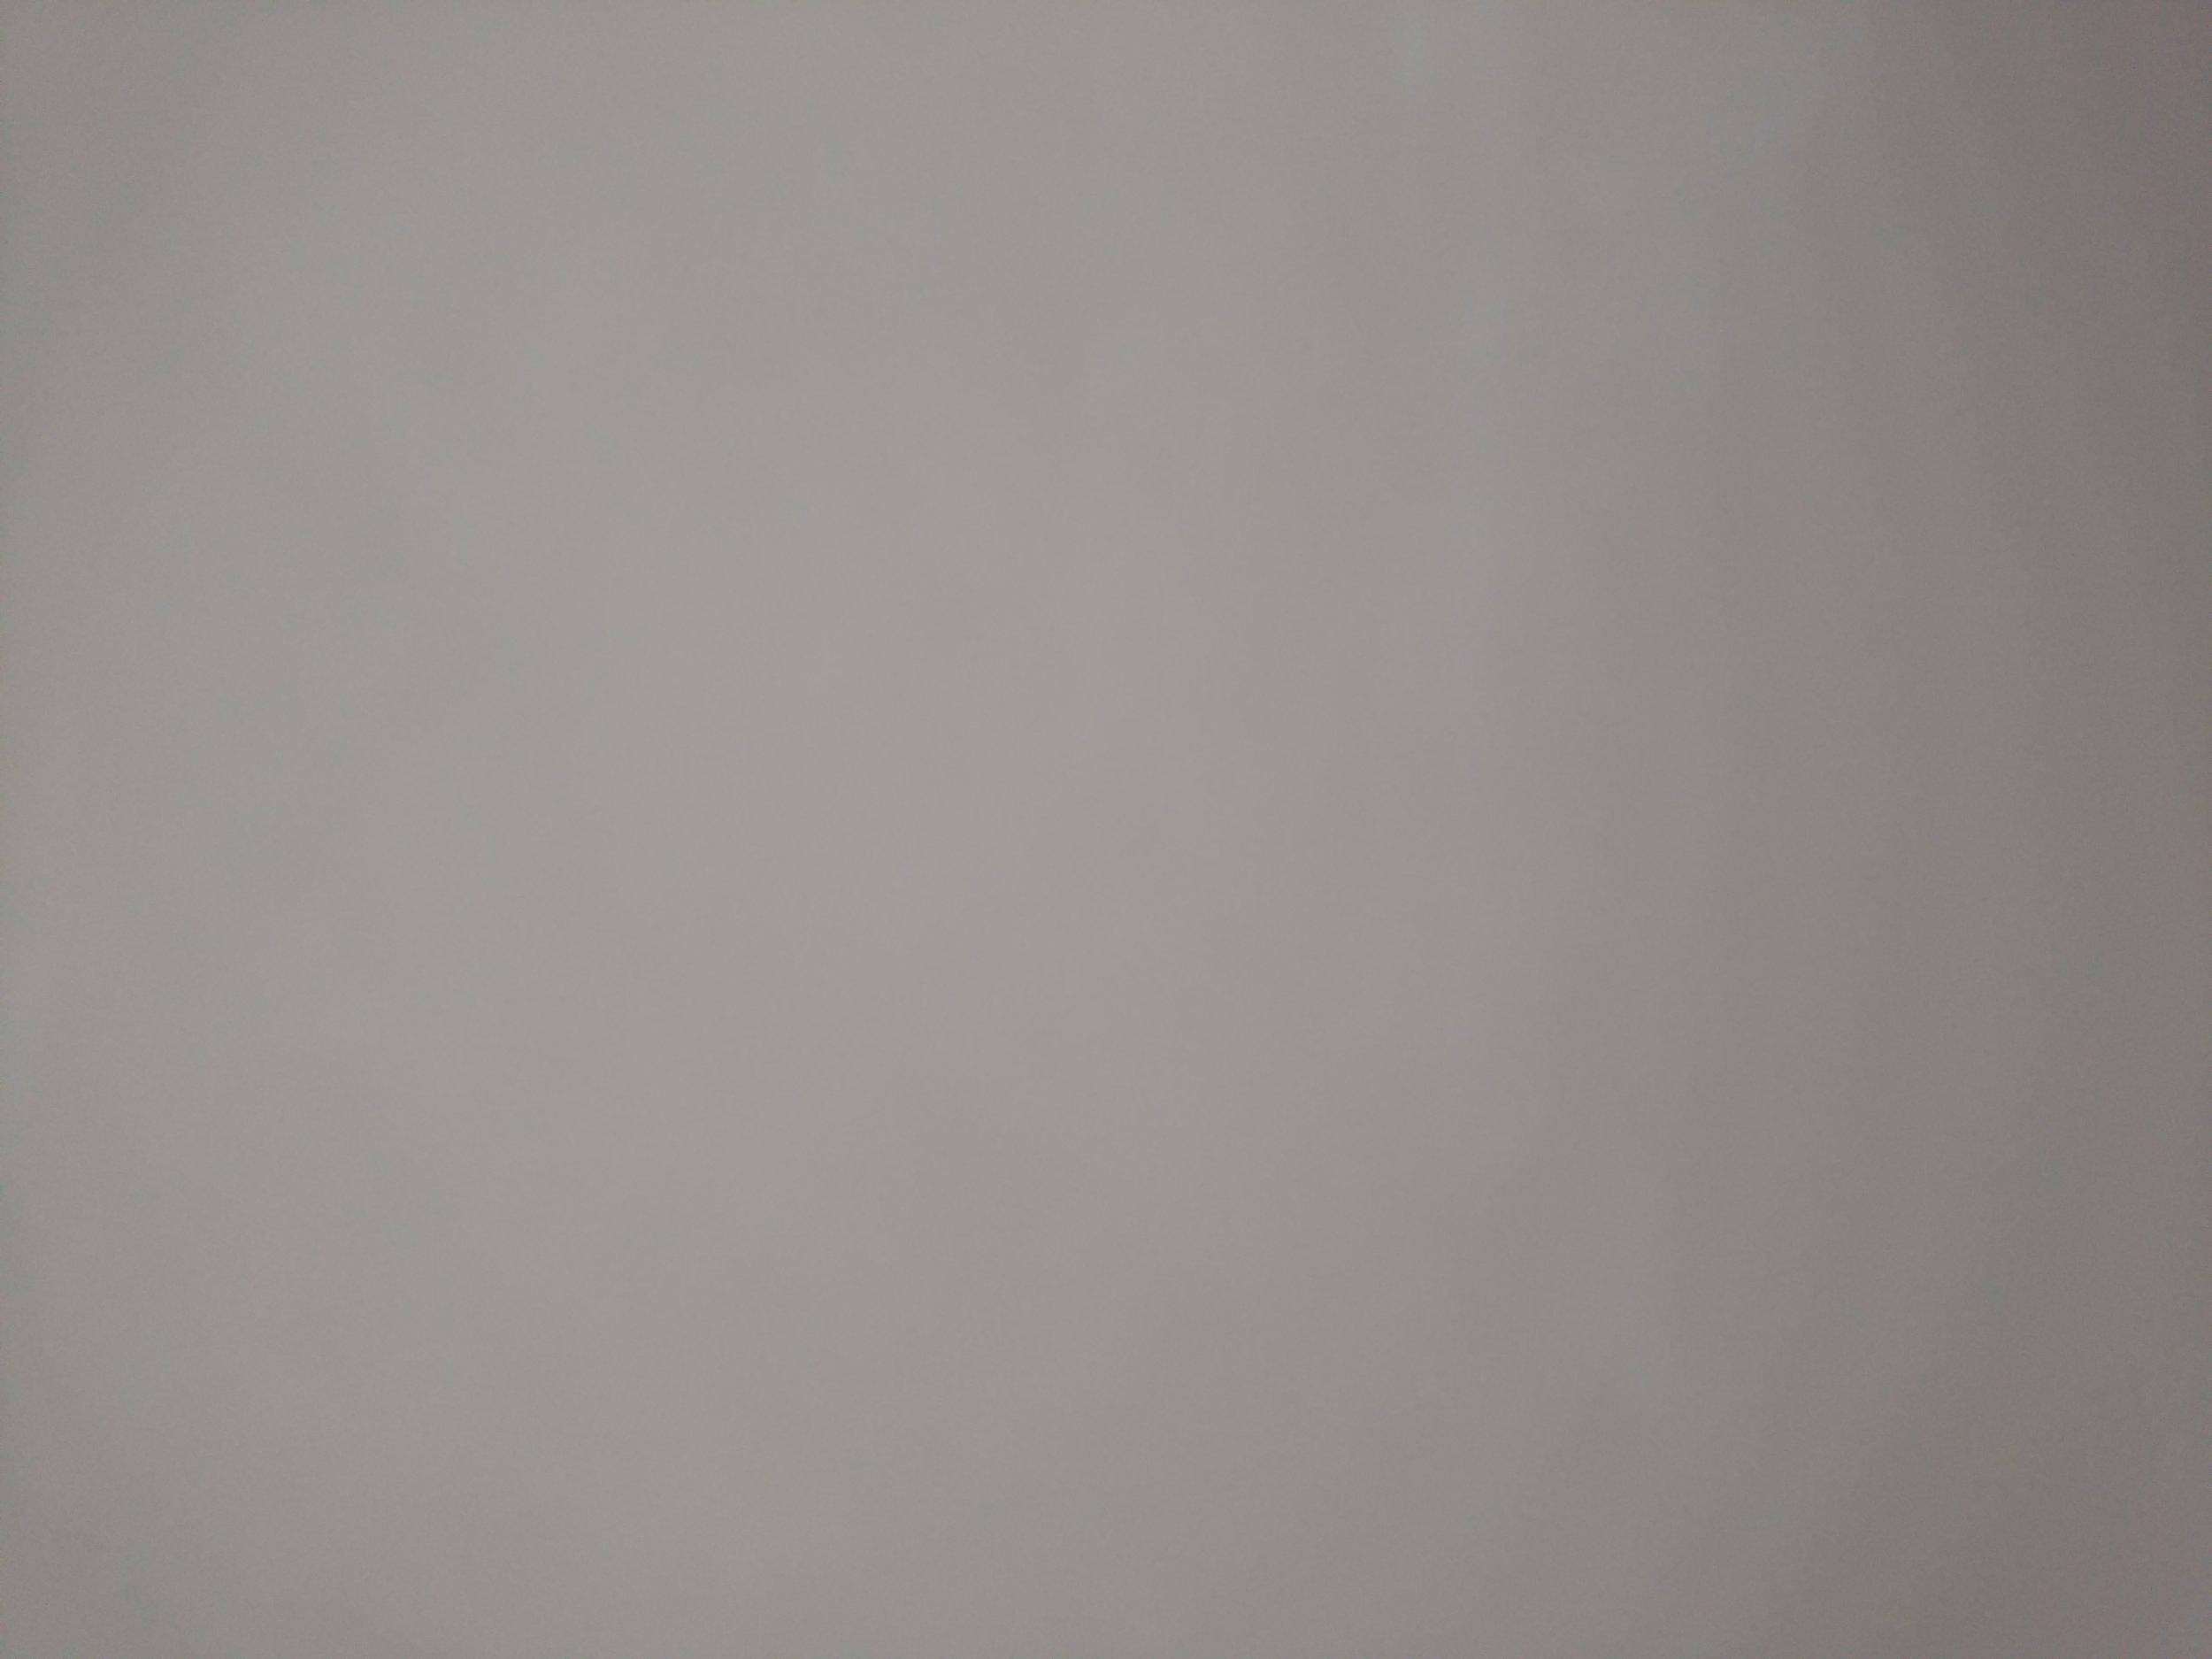 willroth-co-free-texture-gradient-014.jpg